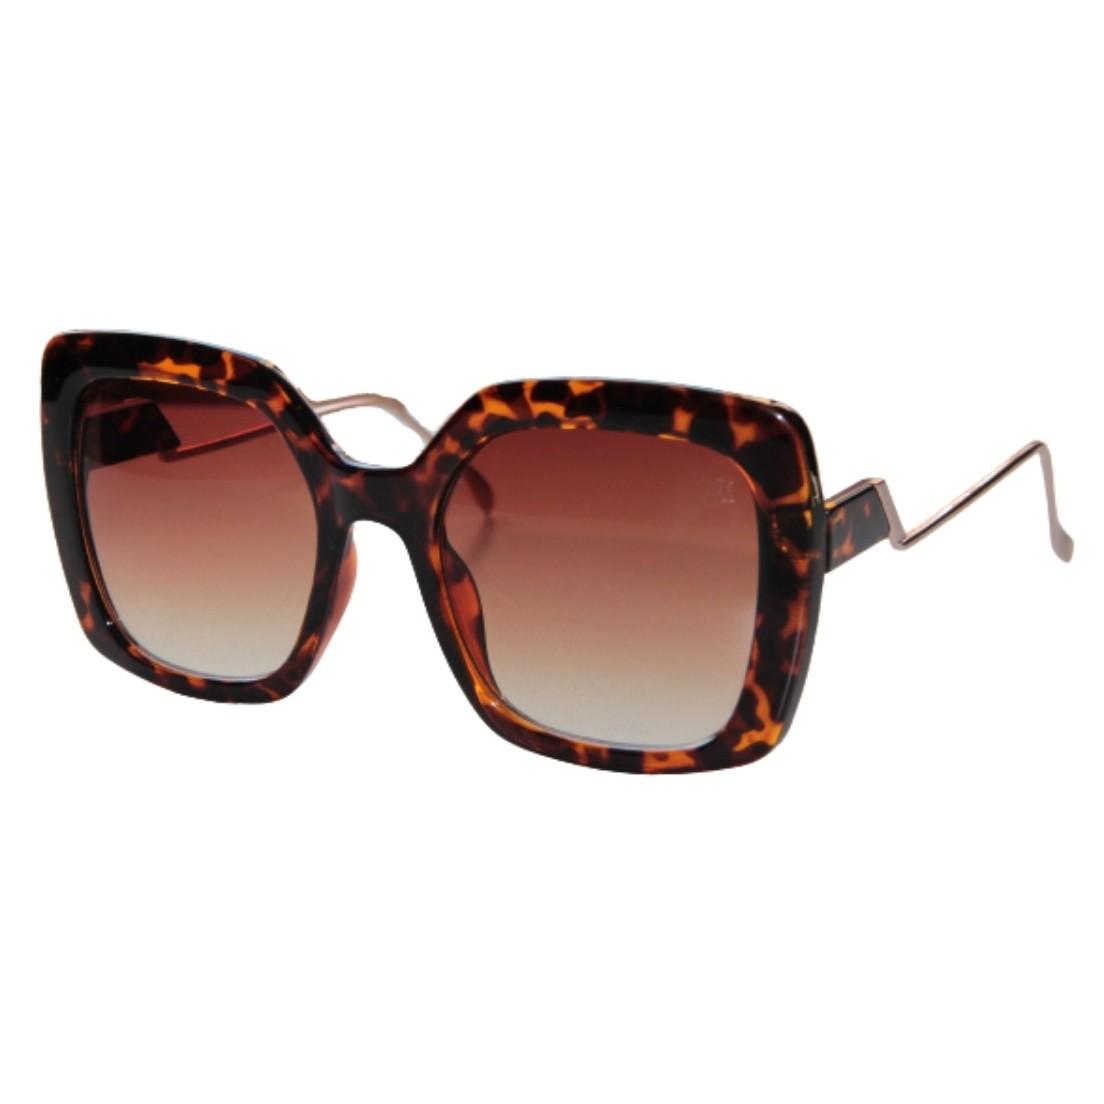 Óculos de Sol Khatto Retrô Square Lyli II Italiano - PU